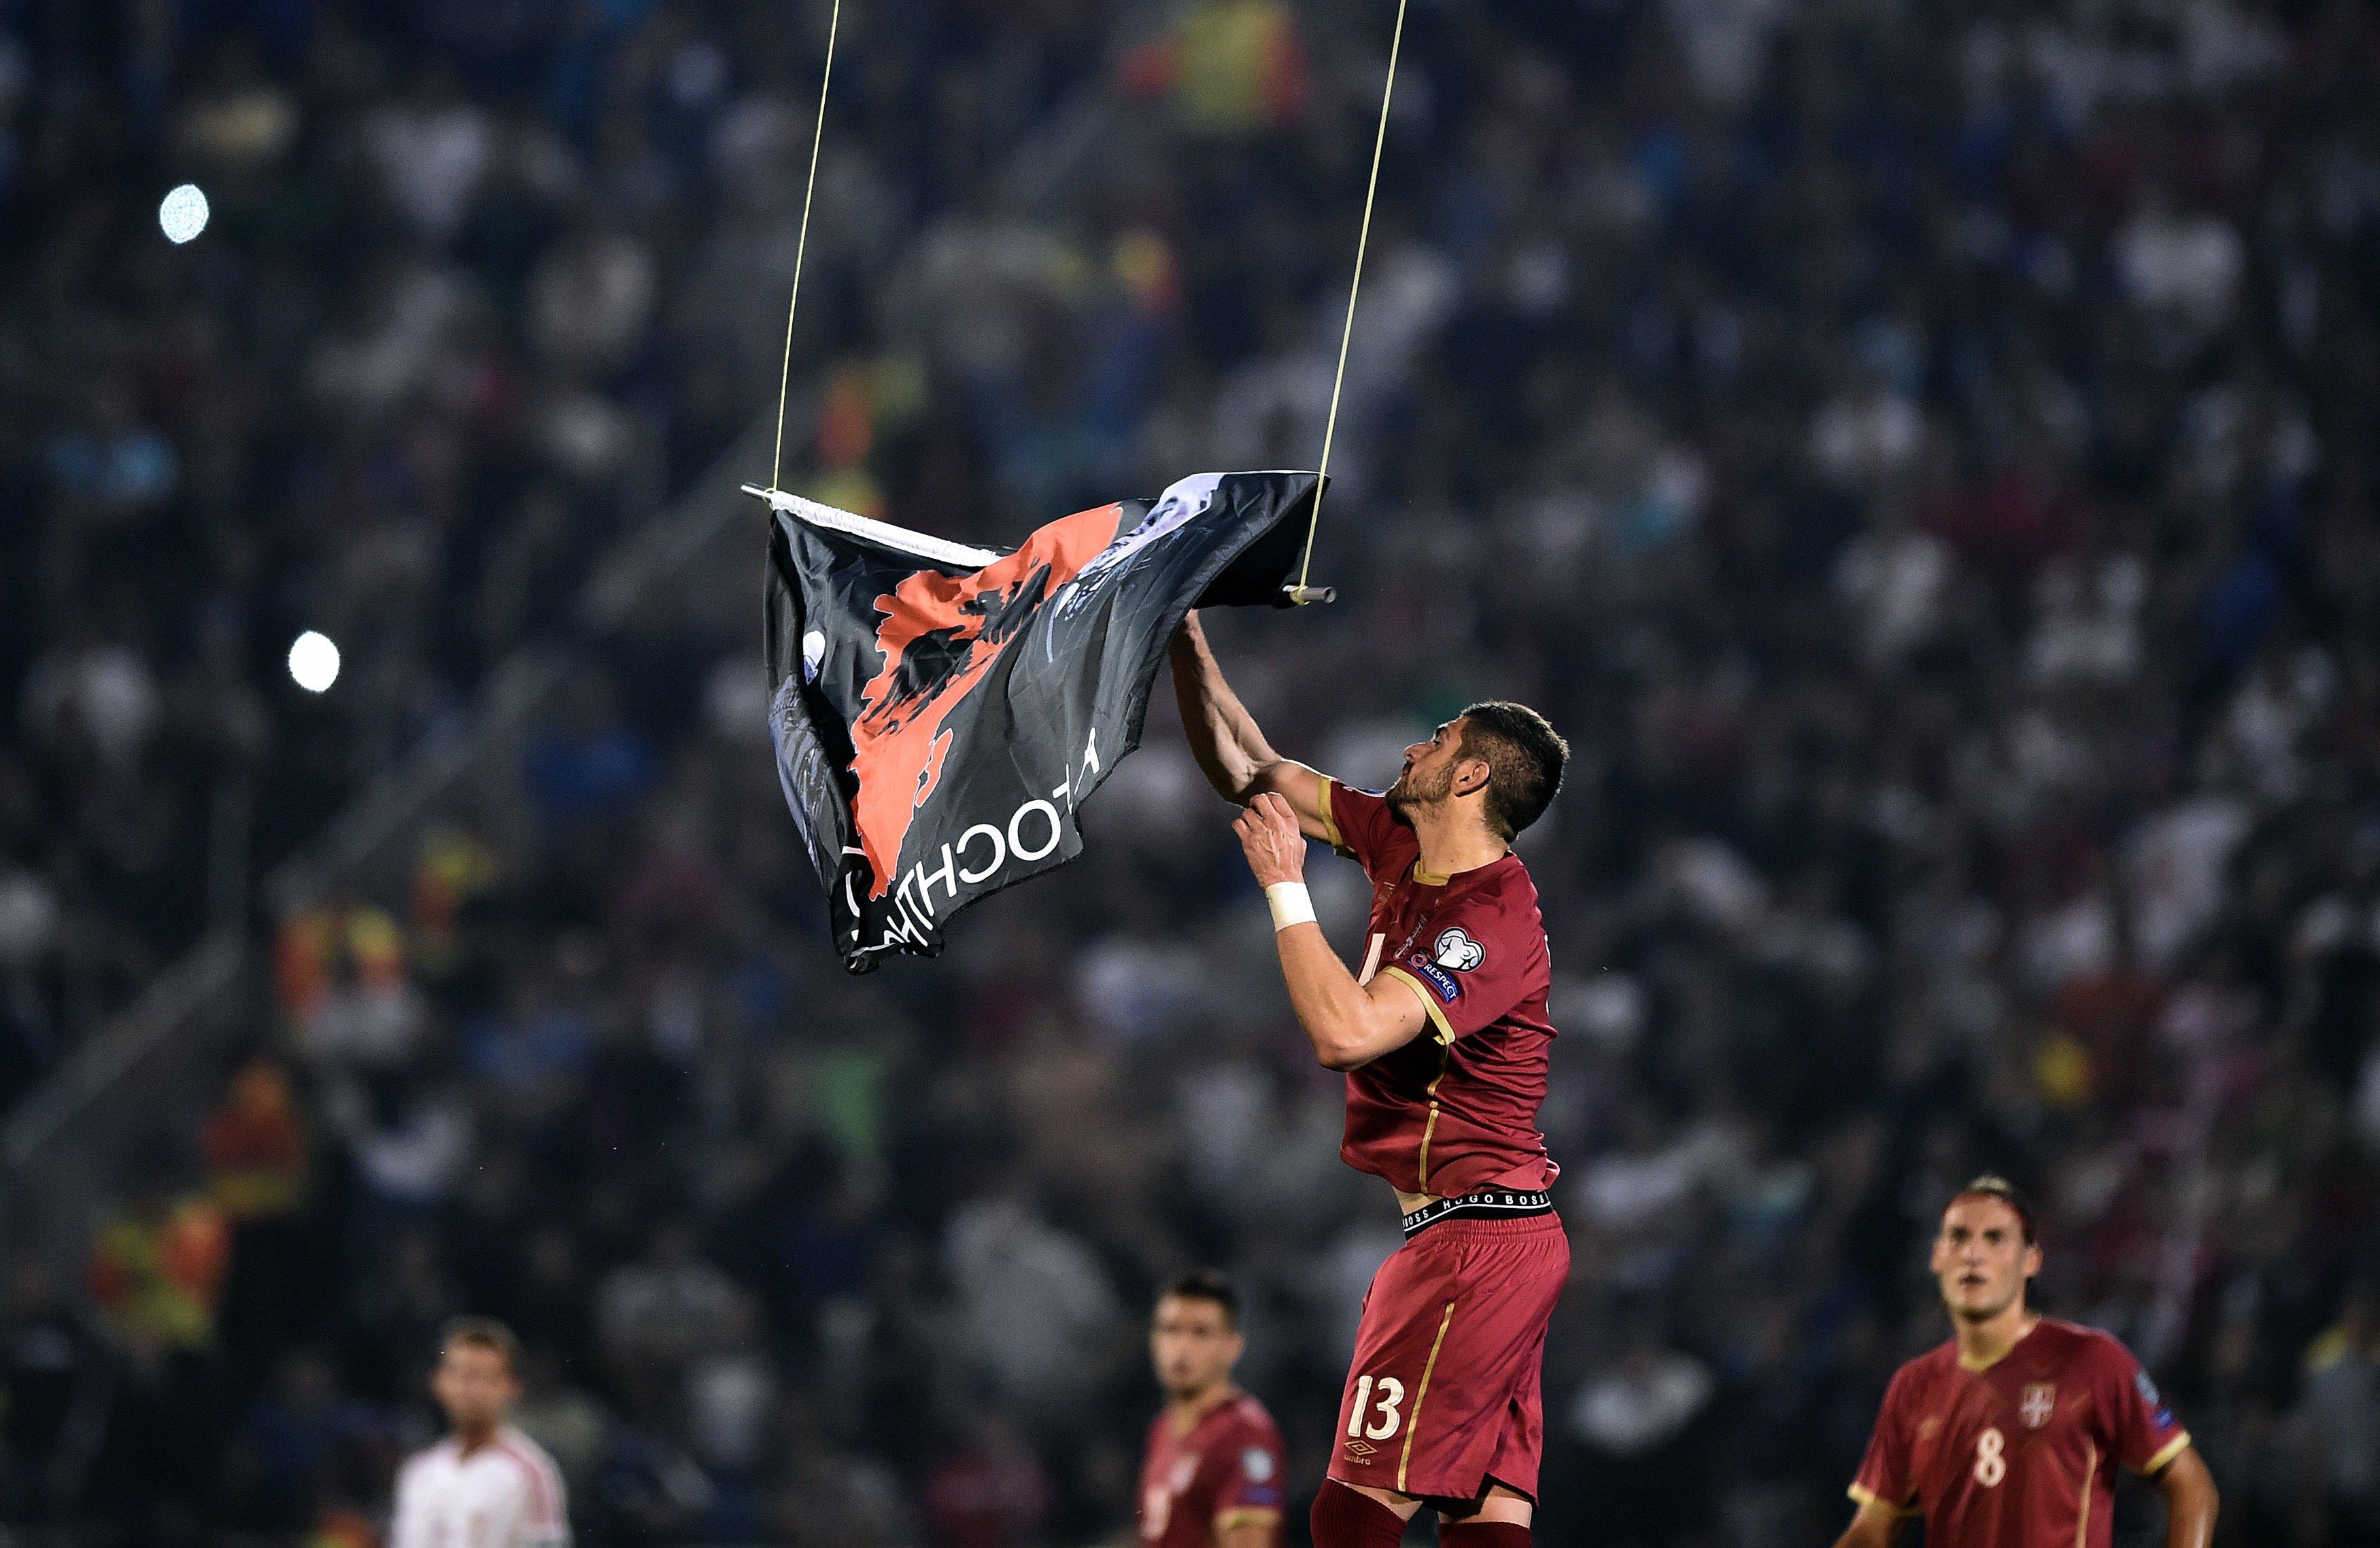 Rama's brother provokes chaos at Belgrade stadium